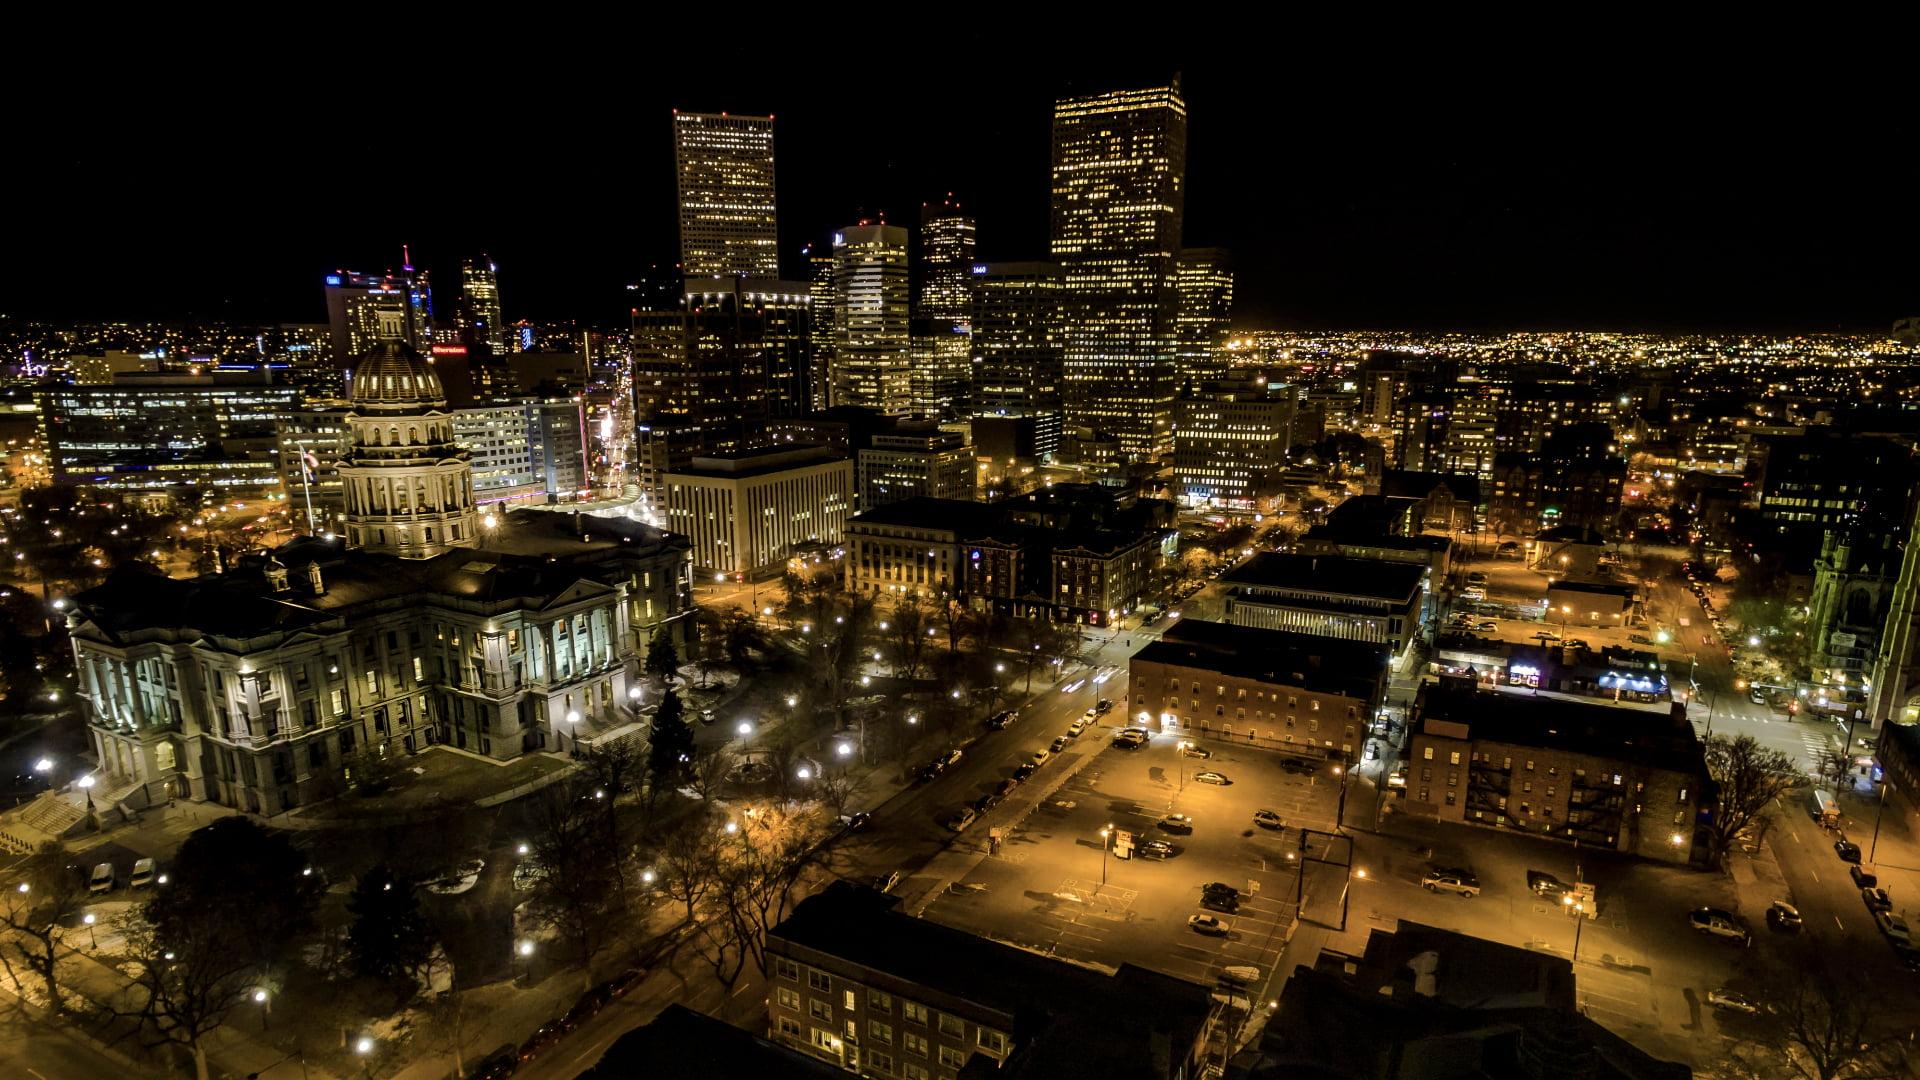 Denver, Colorado at night - photo by Piqsels under CC0